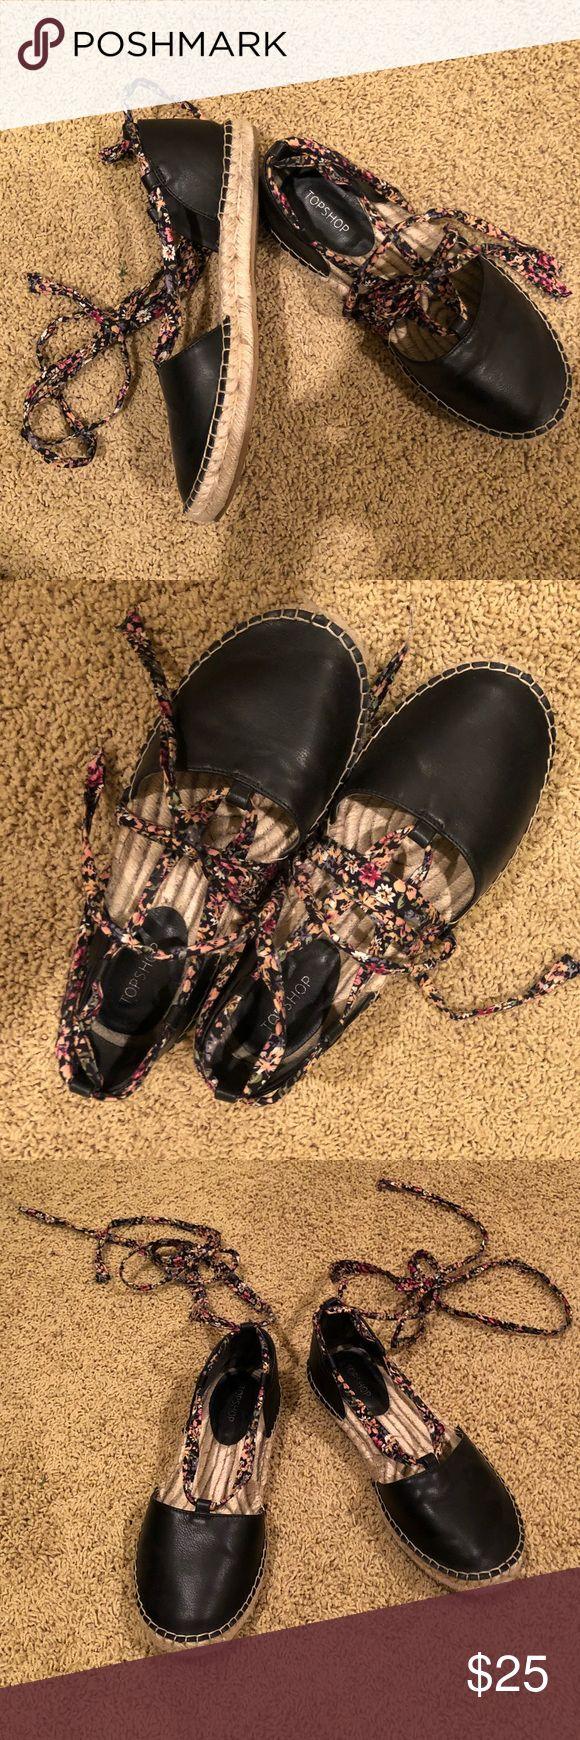 Topshop espadrilles CUTE floral topshop tie-up espadrilles Topshop Shoes Espadrilles